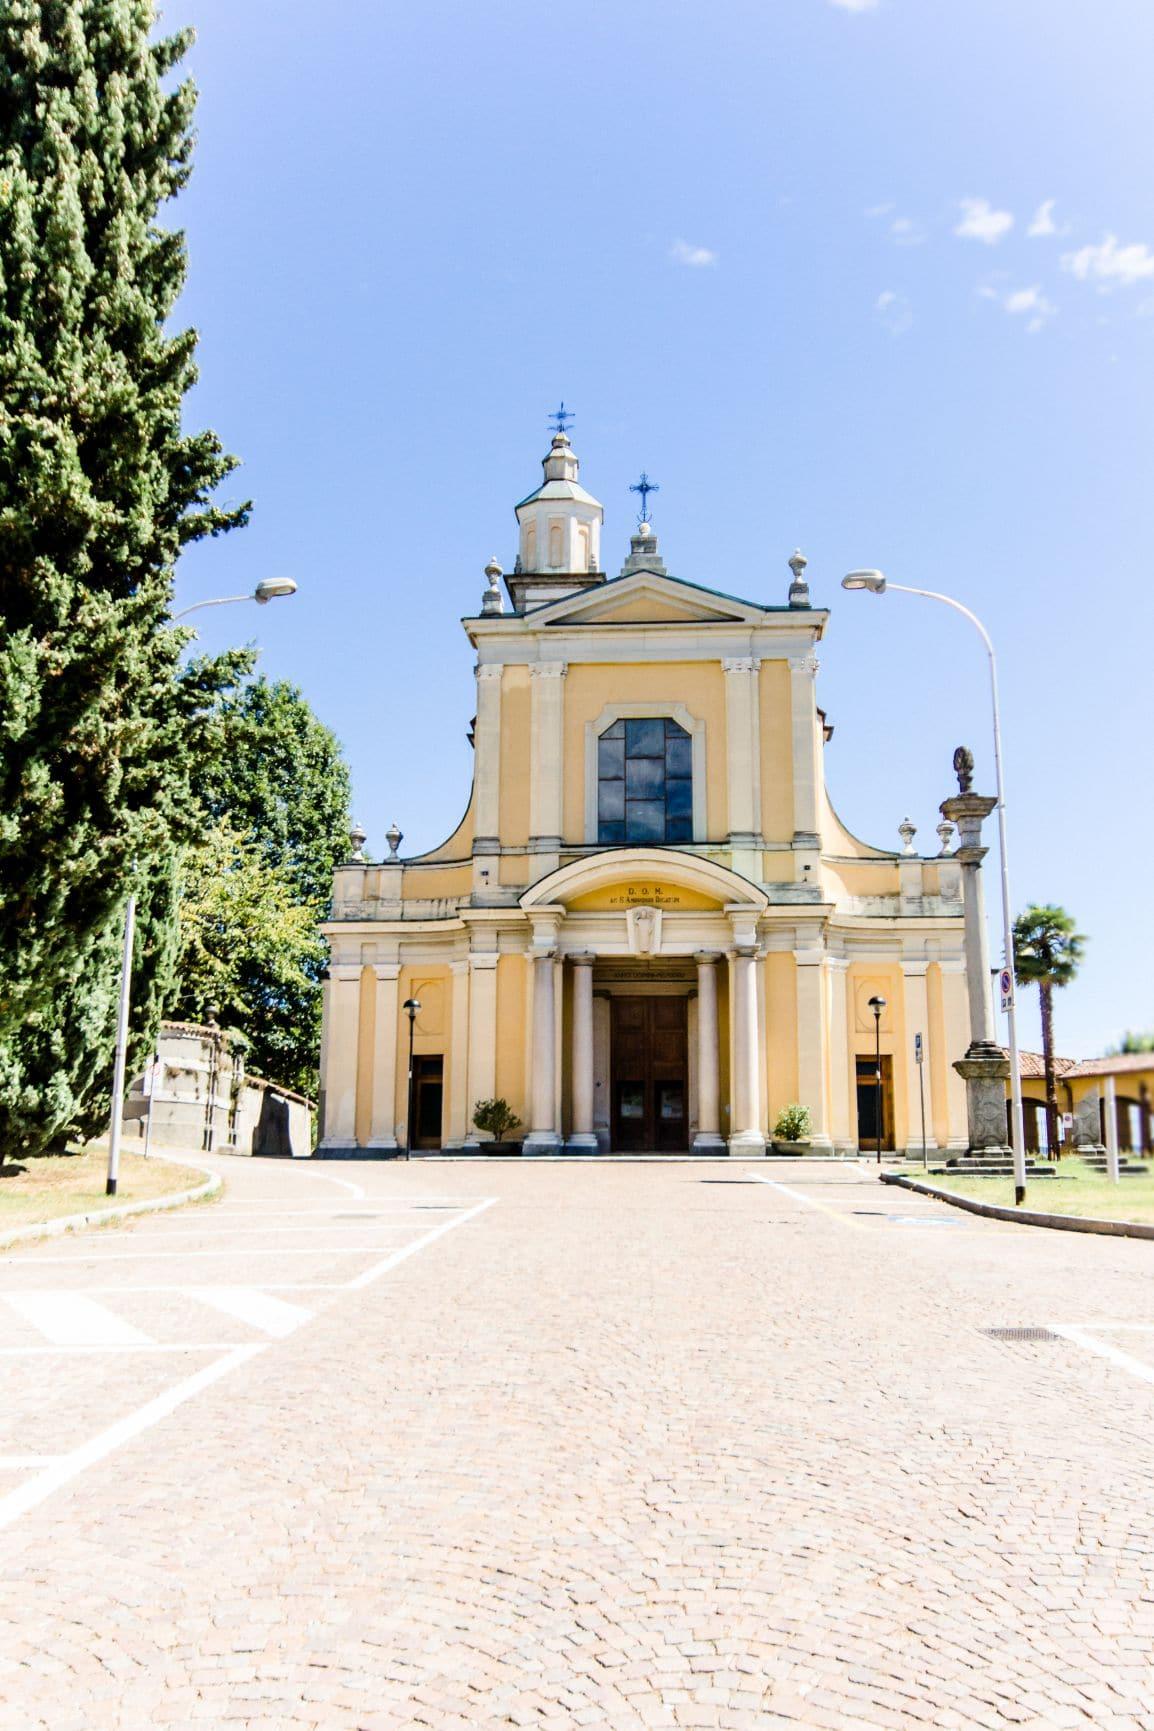 Million Memories_A&D_Hochzeitsfotograf_Schlosshochzeit_Toskana_Lago Di Como_Wedding_Tuscany_072